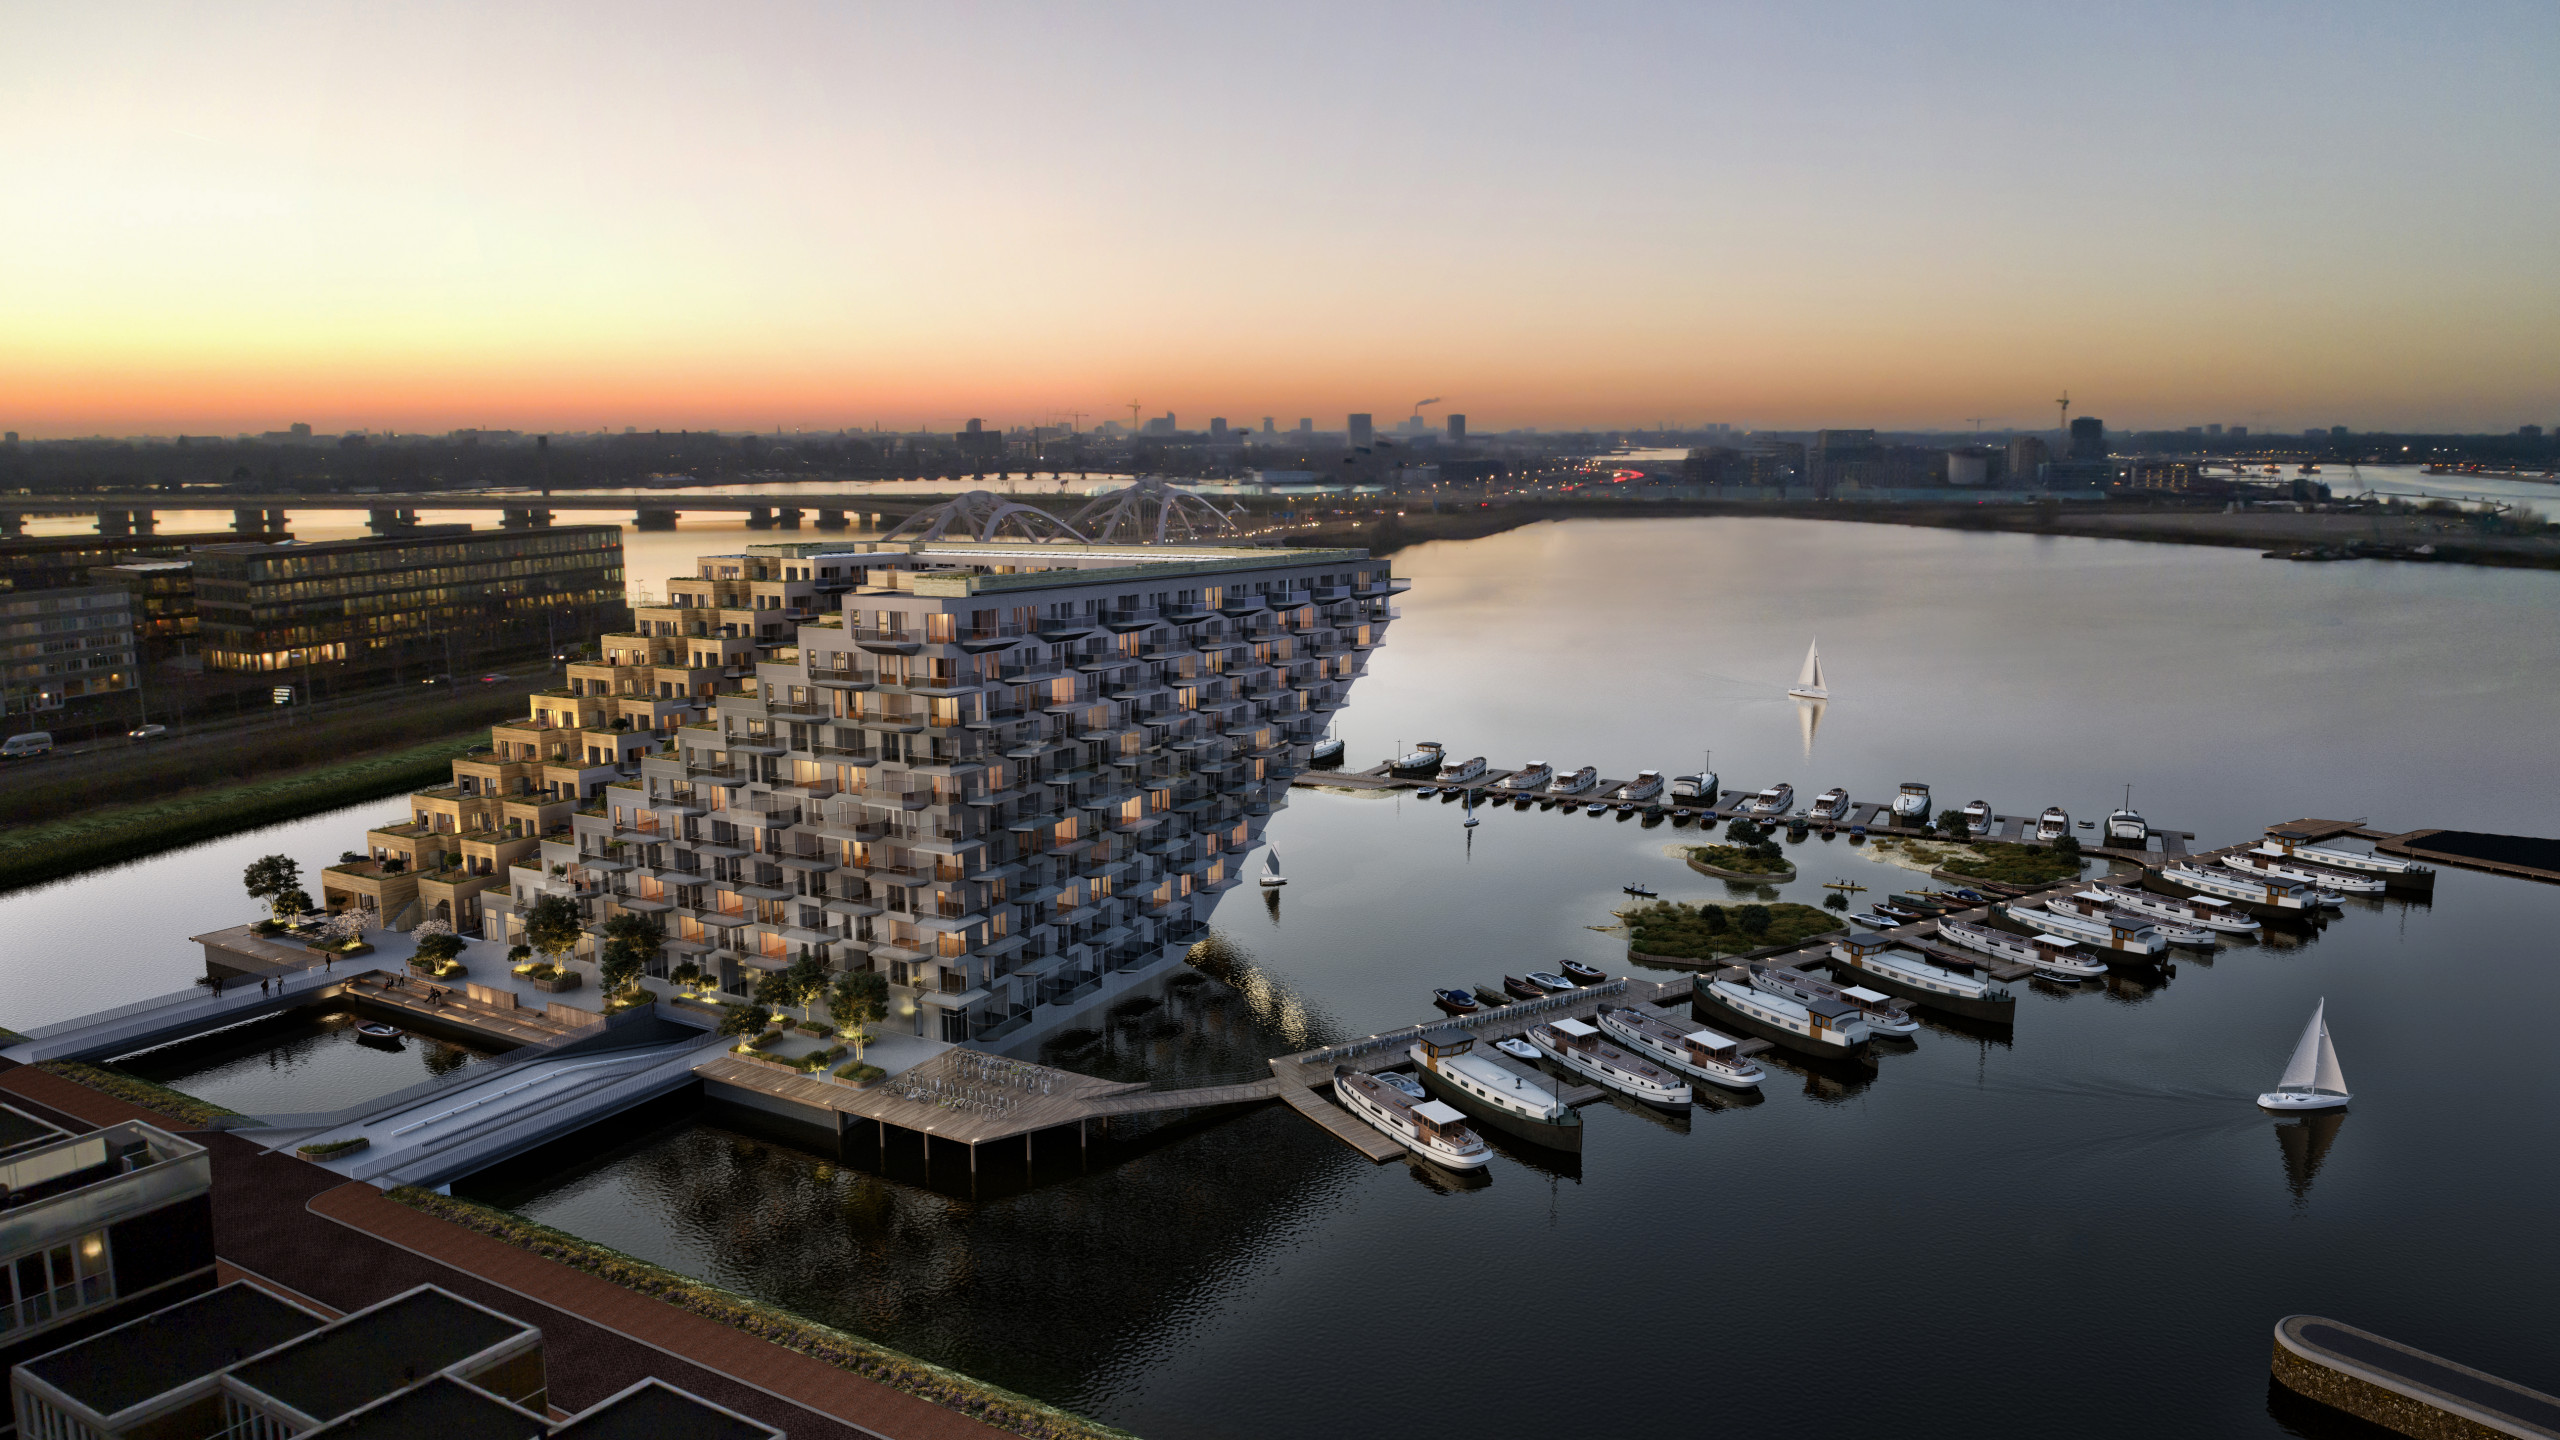 Beeldenfabriek - Waterprogramma Sluishuis Amsterdam